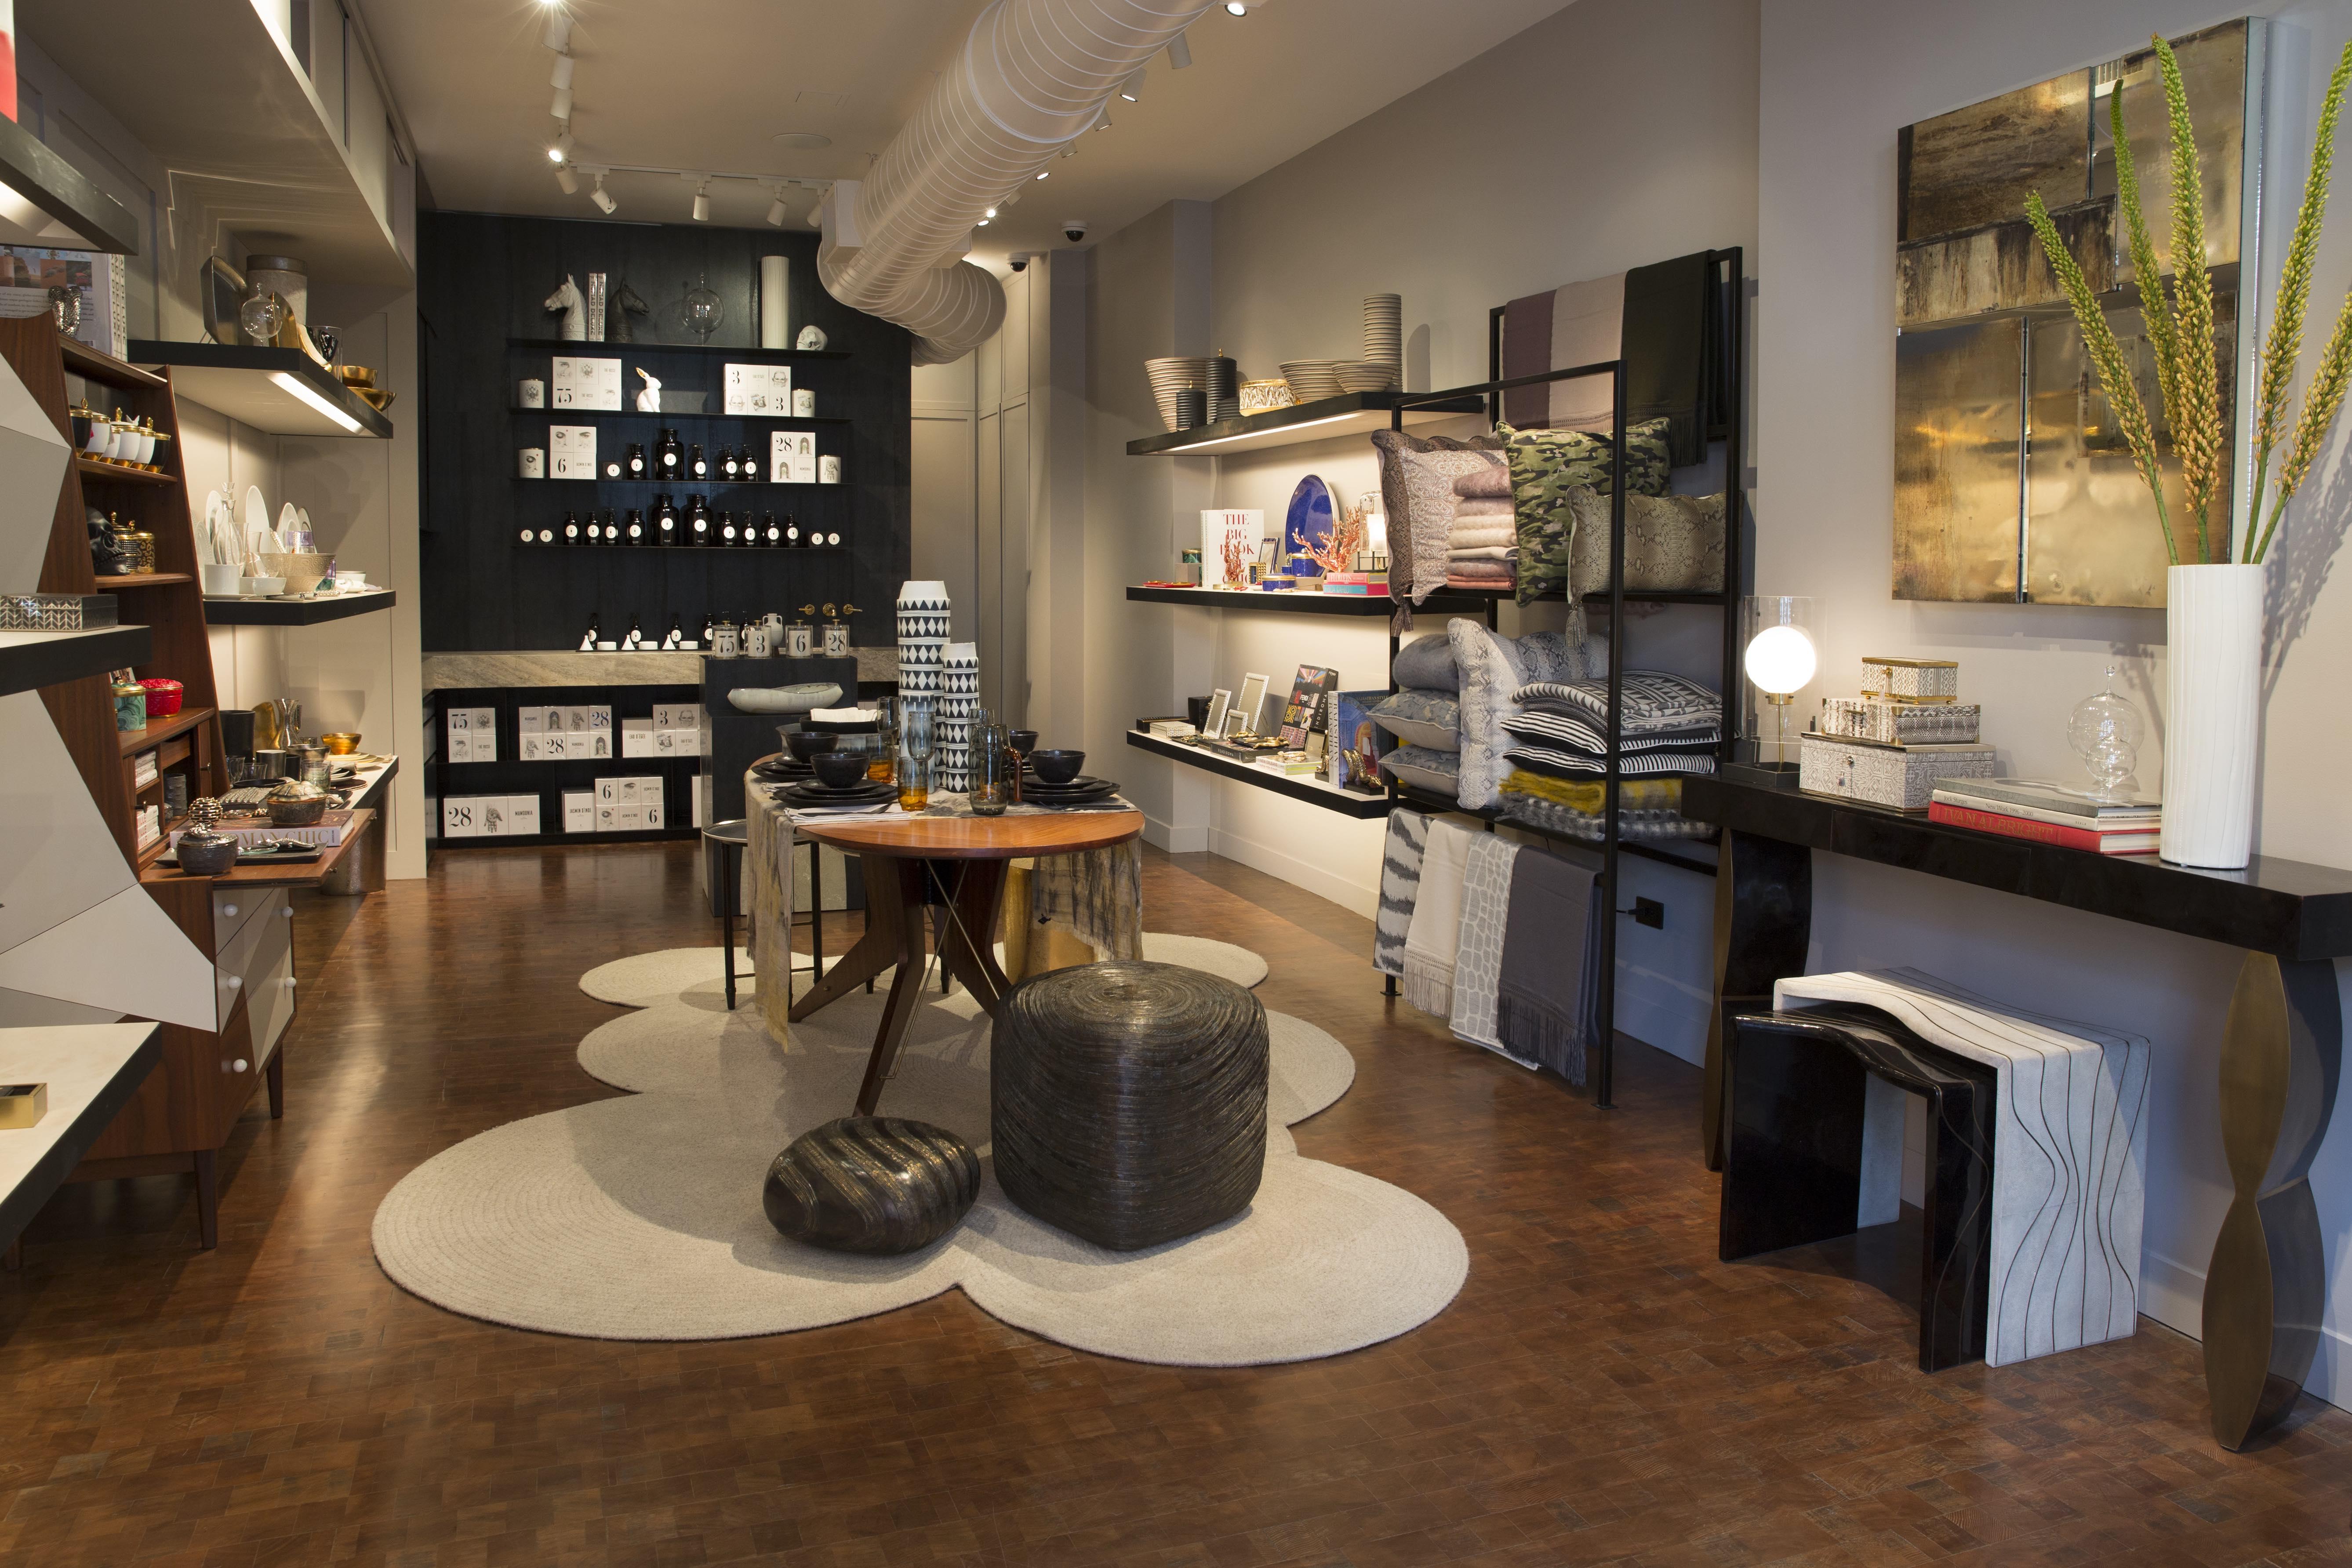 L'Objet. Located at 370 Bleeker in NYC. © L'Objet